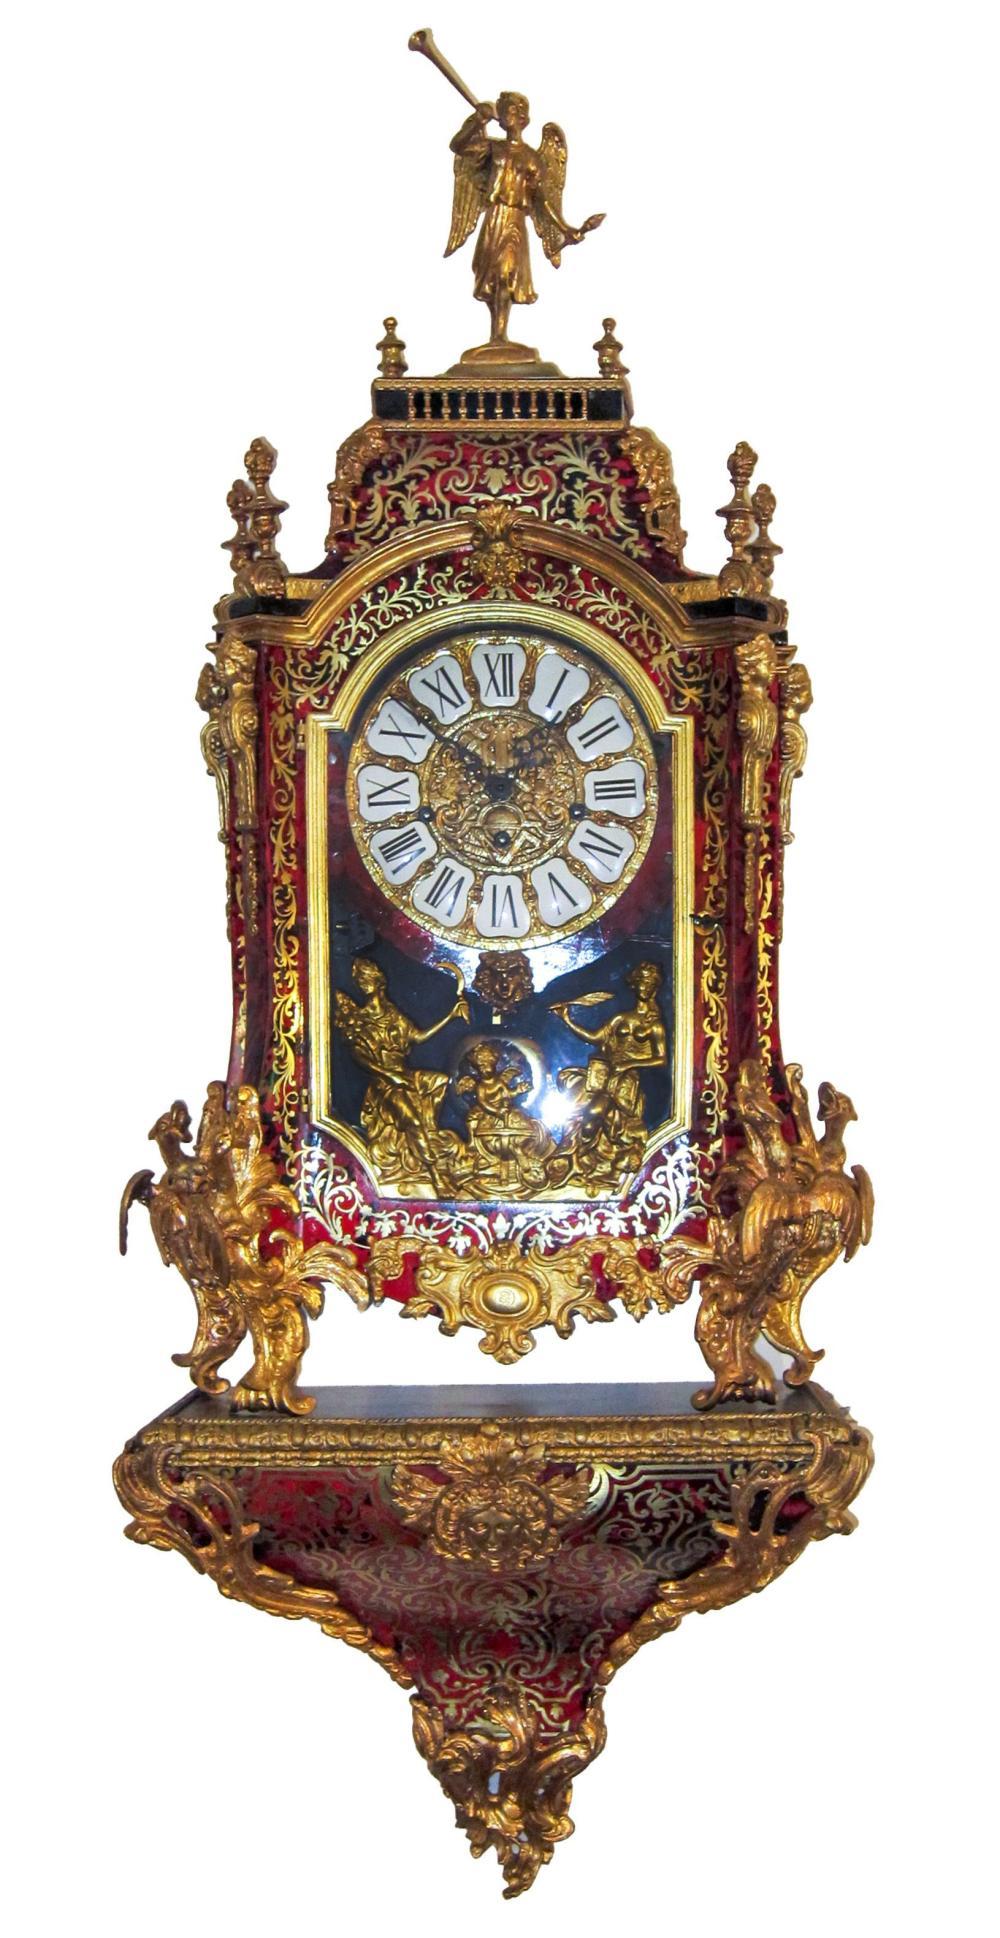 Boulle-style bracket clock